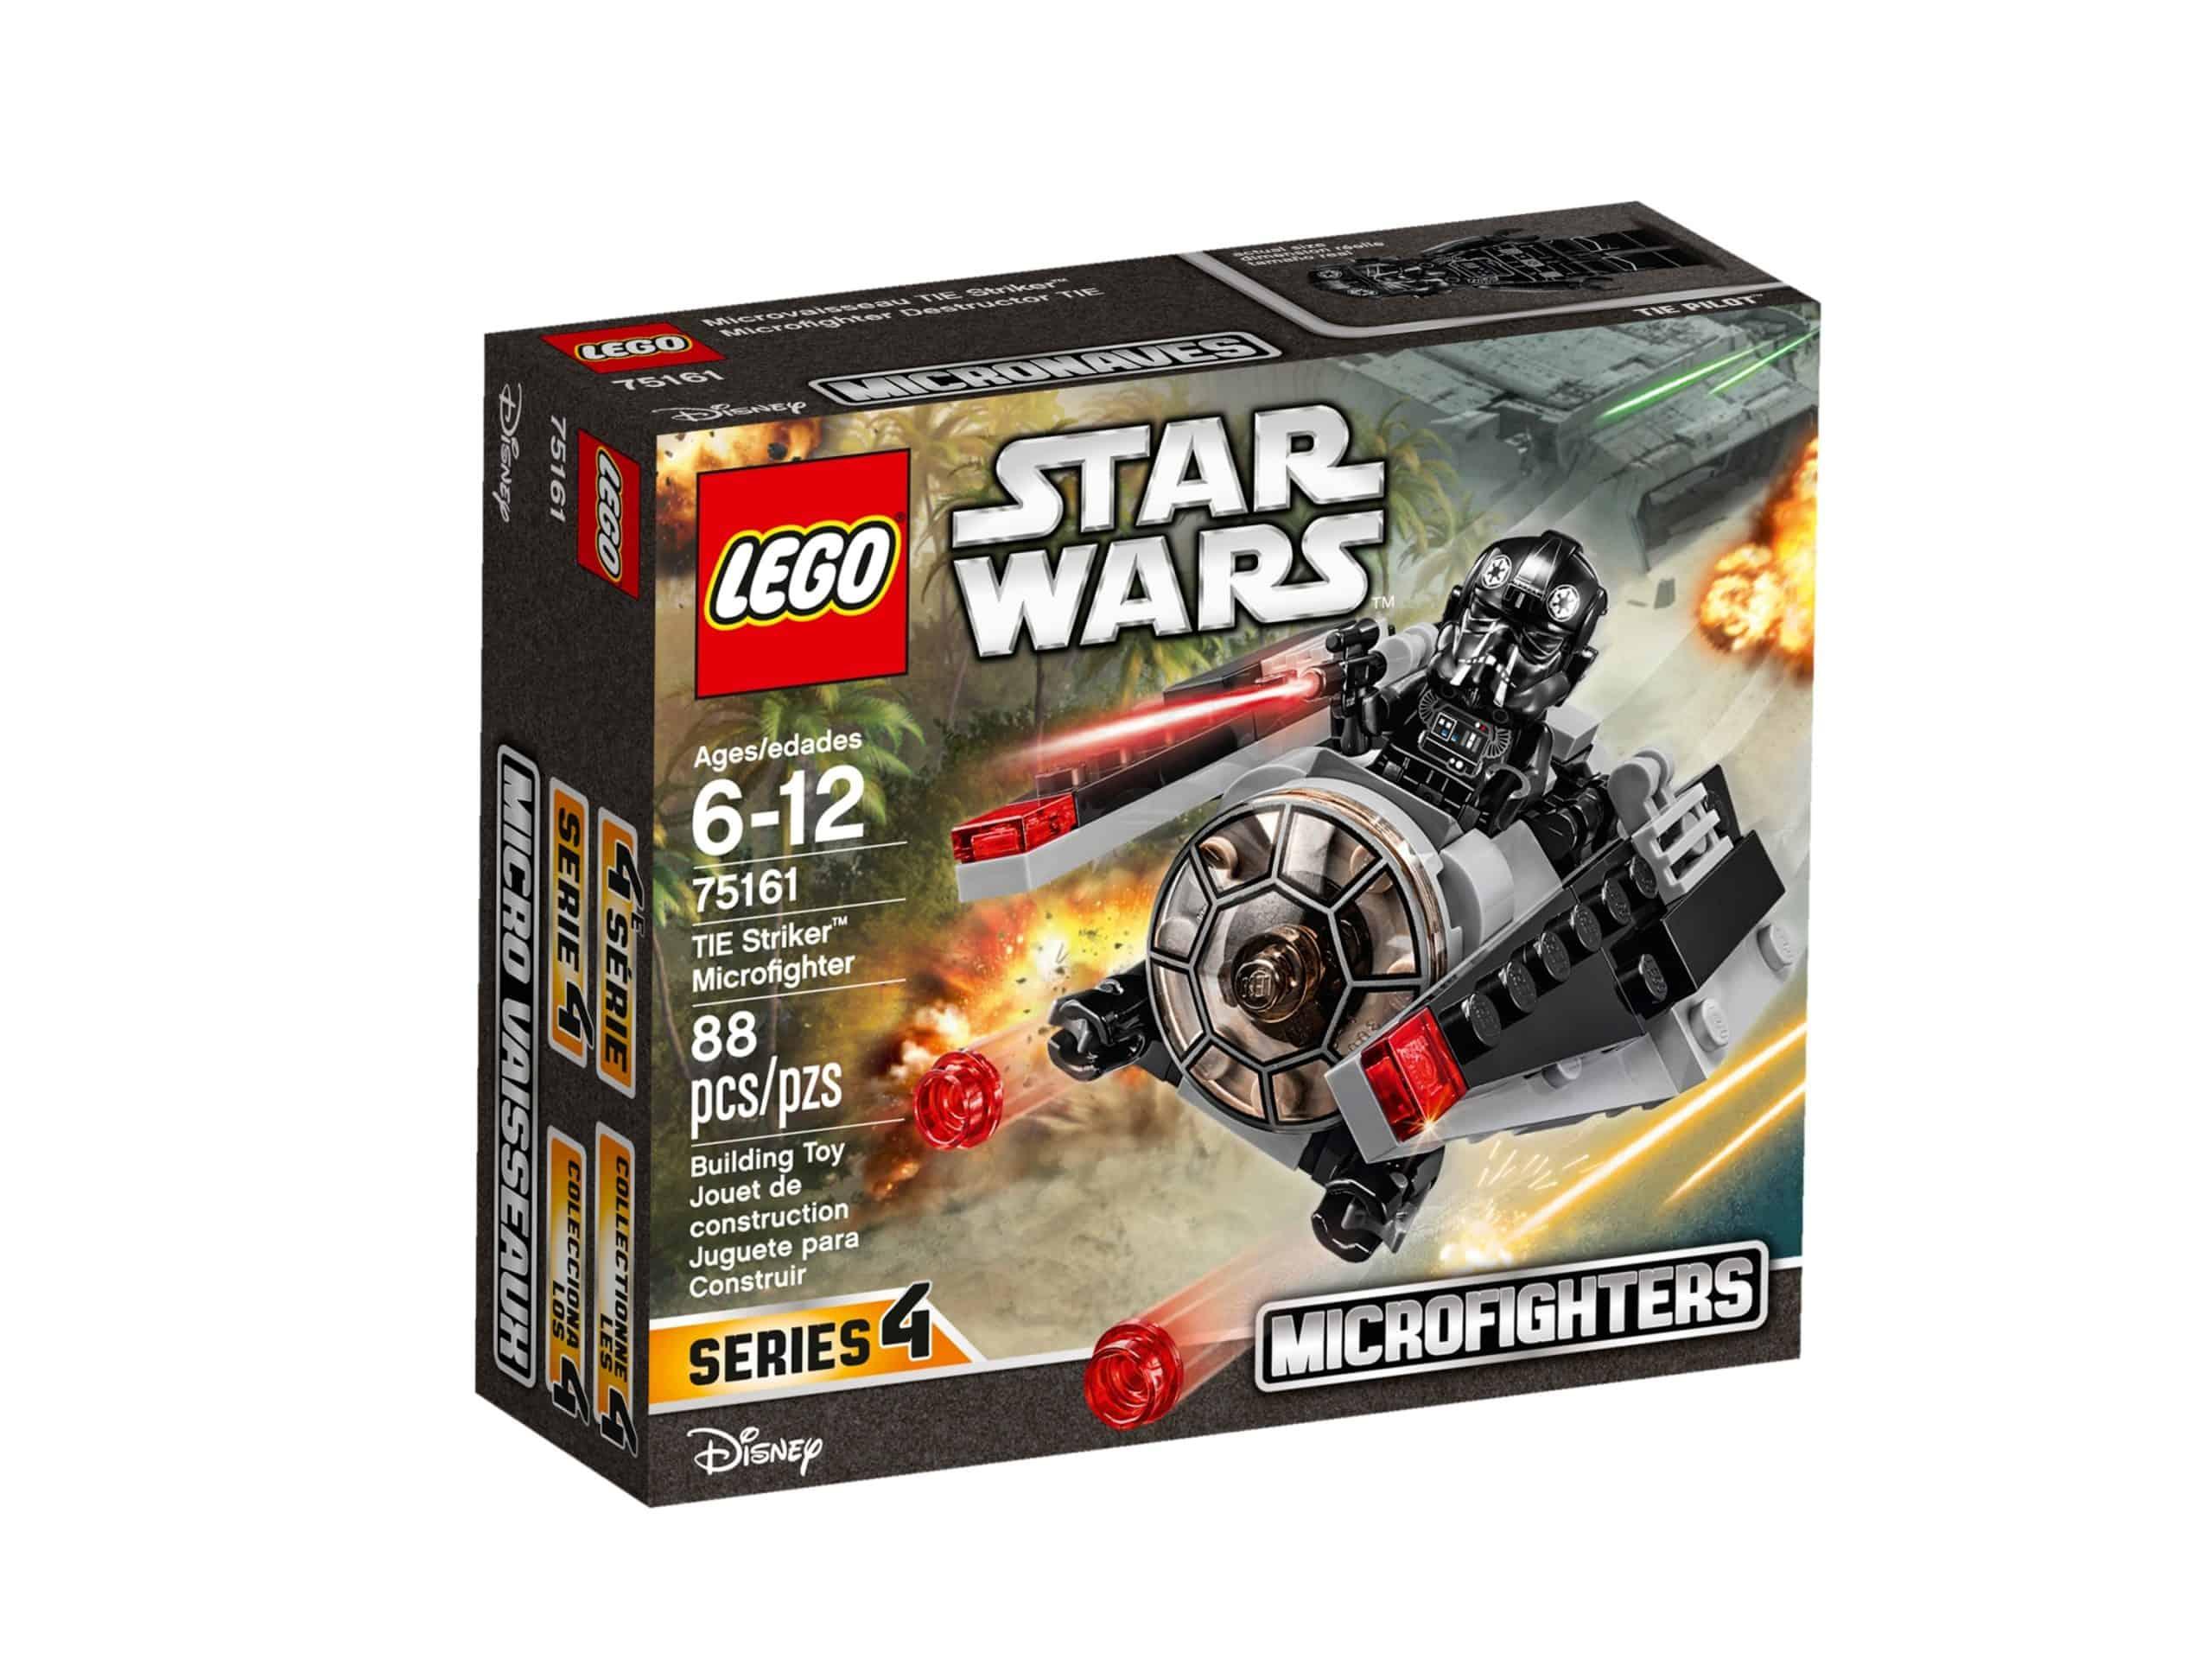 lego 75161 tie striker microfighter scaled